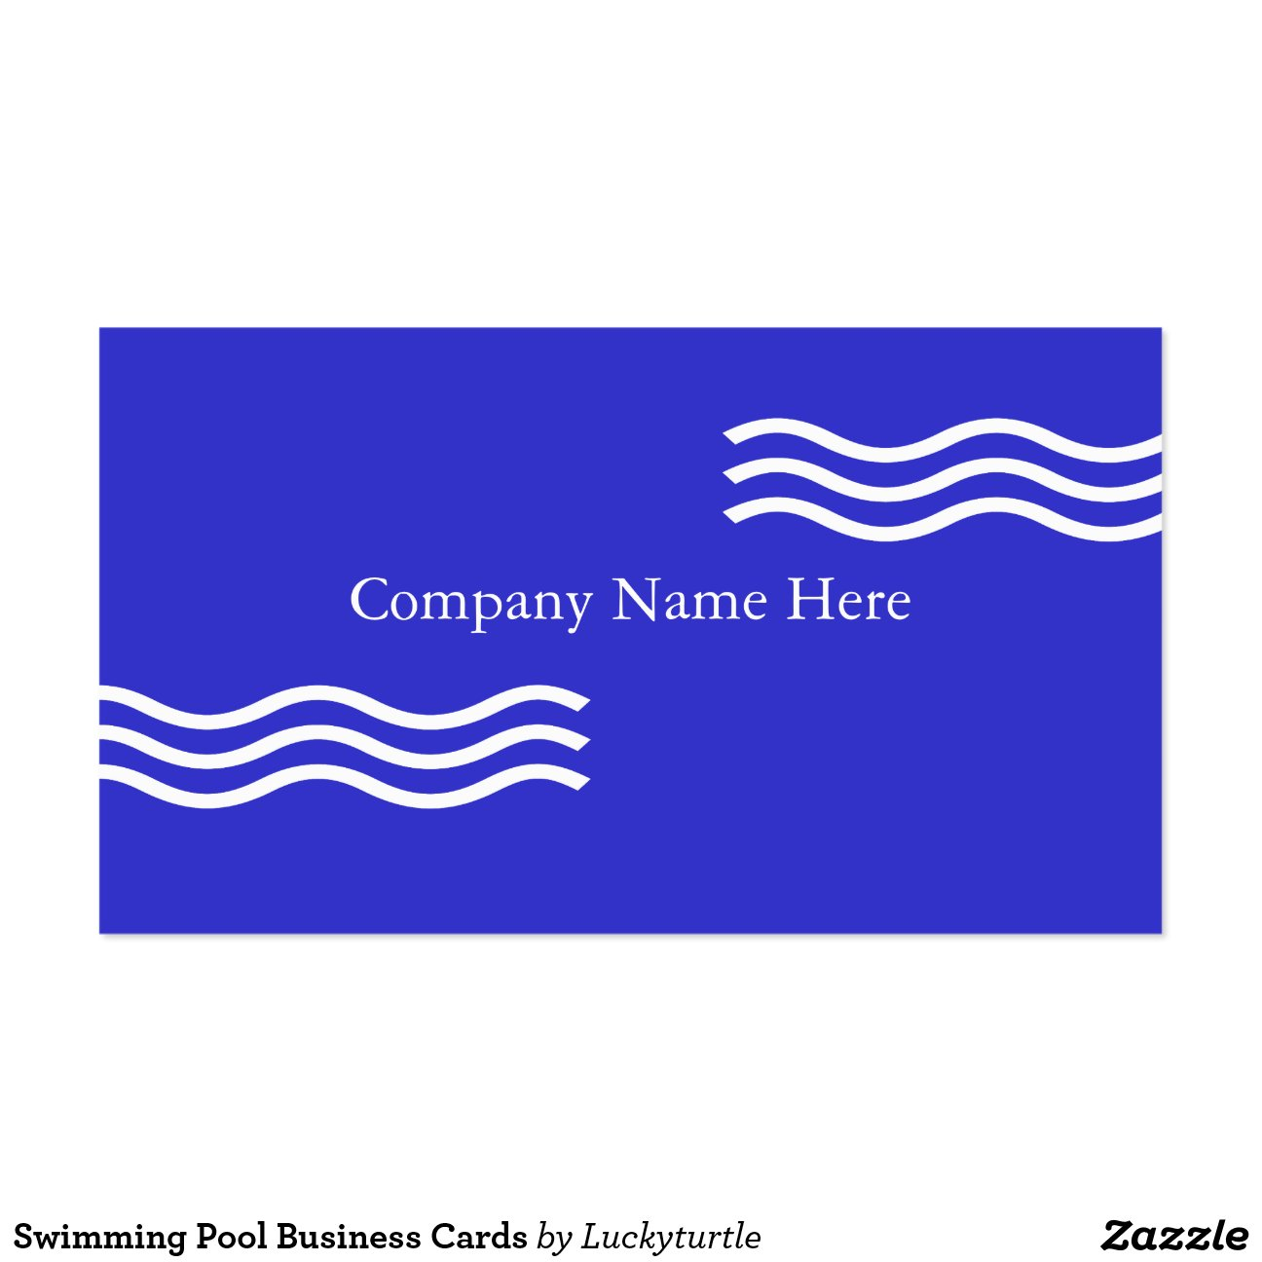 cartes de visite de piscine carte de visite standard zazzle. Black Bedroom Furniture Sets. Home Design Ideas